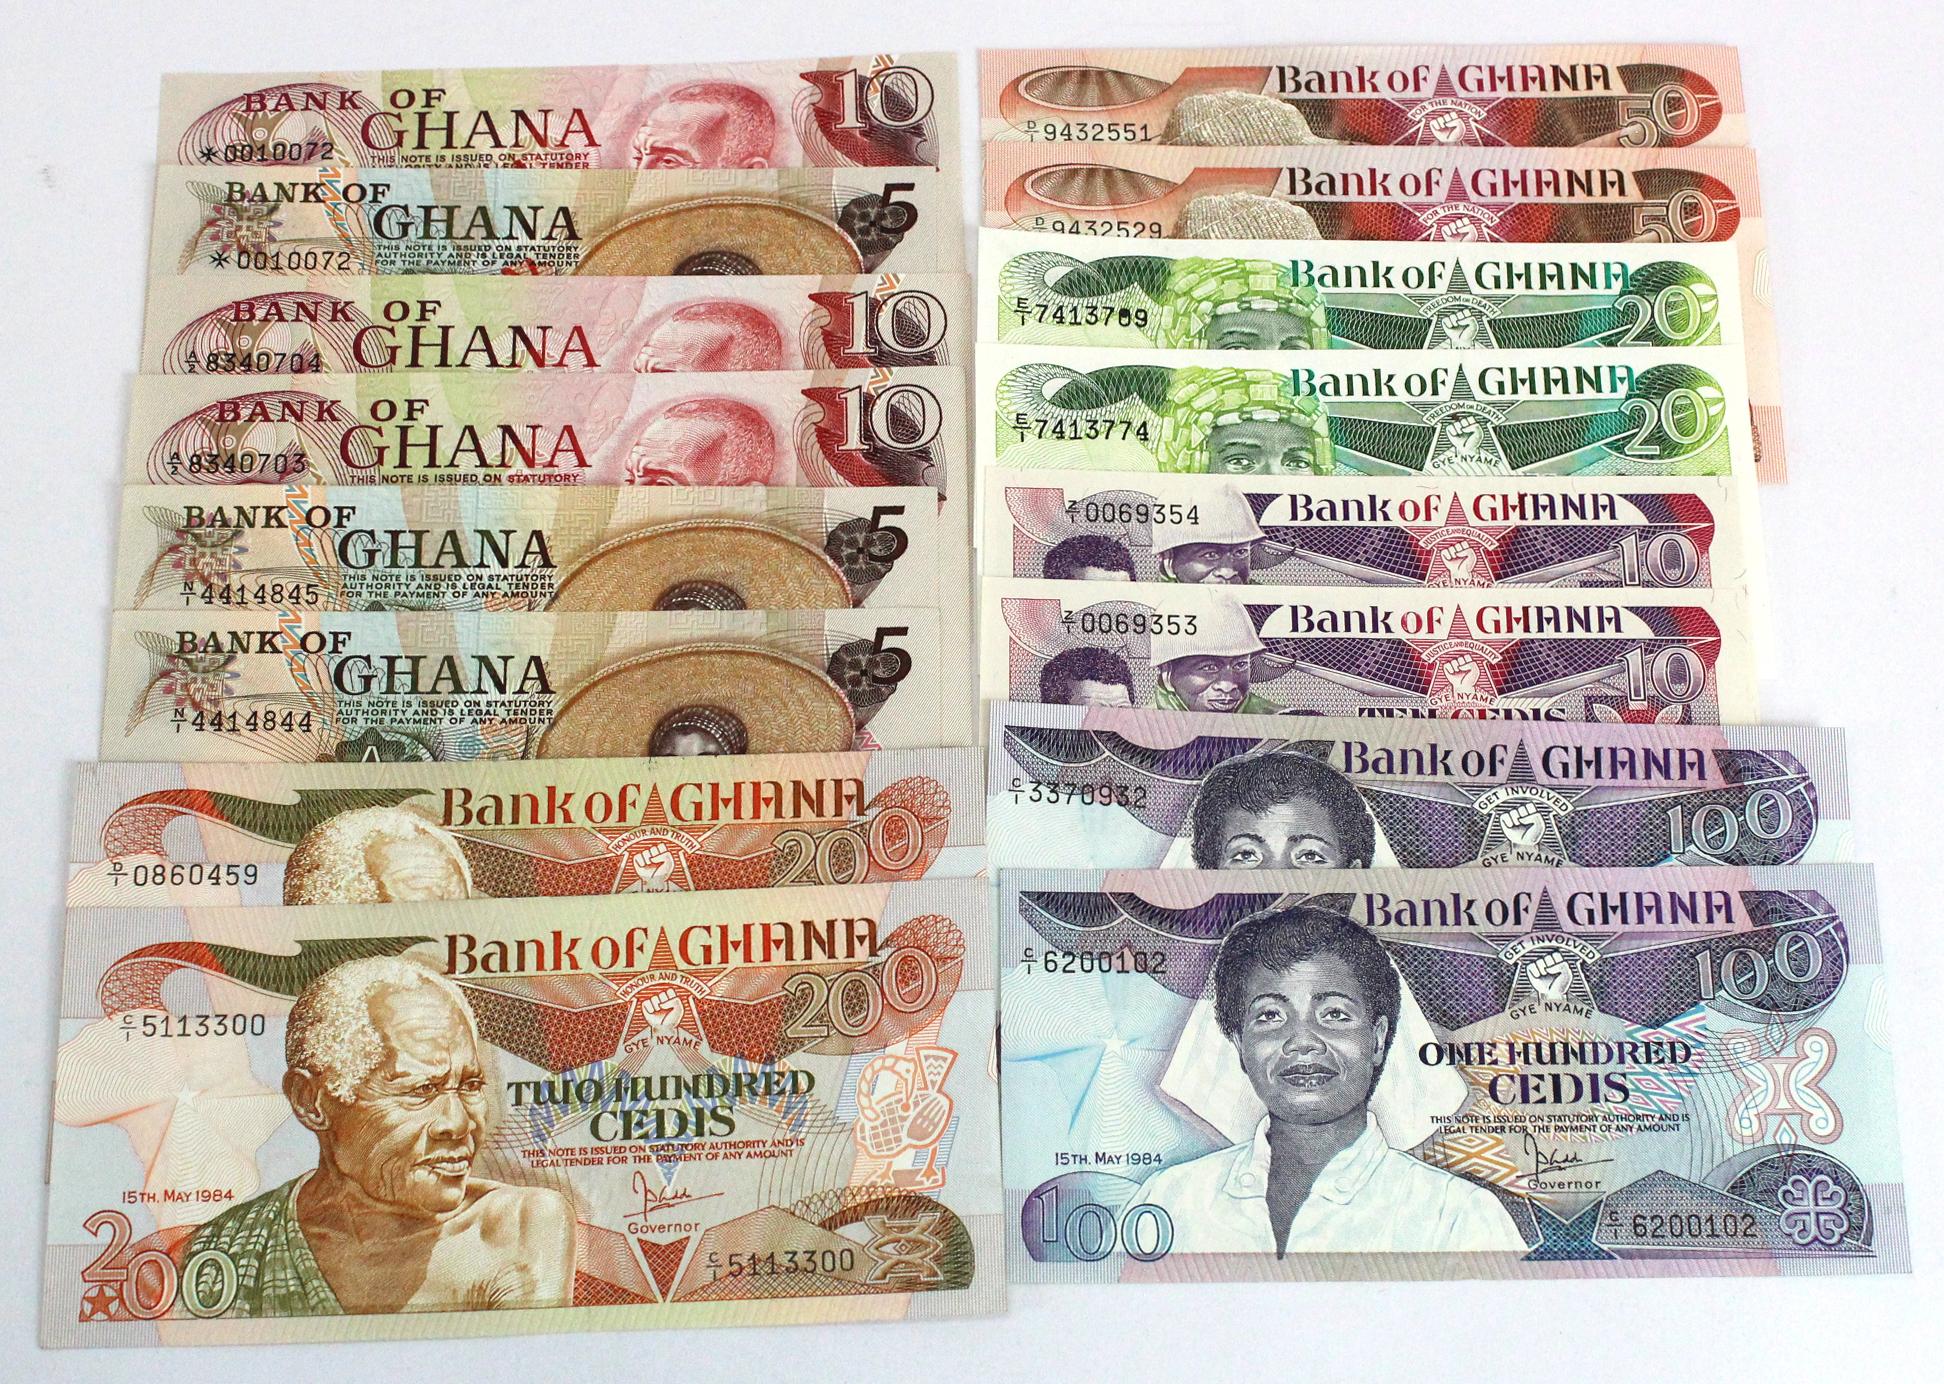 Ghana (16), 200 Cedis (2), 100 Cedis (2), 50 Cedis (2), 20 Cedis (2) & 10 Cedis (2), (these Z/1